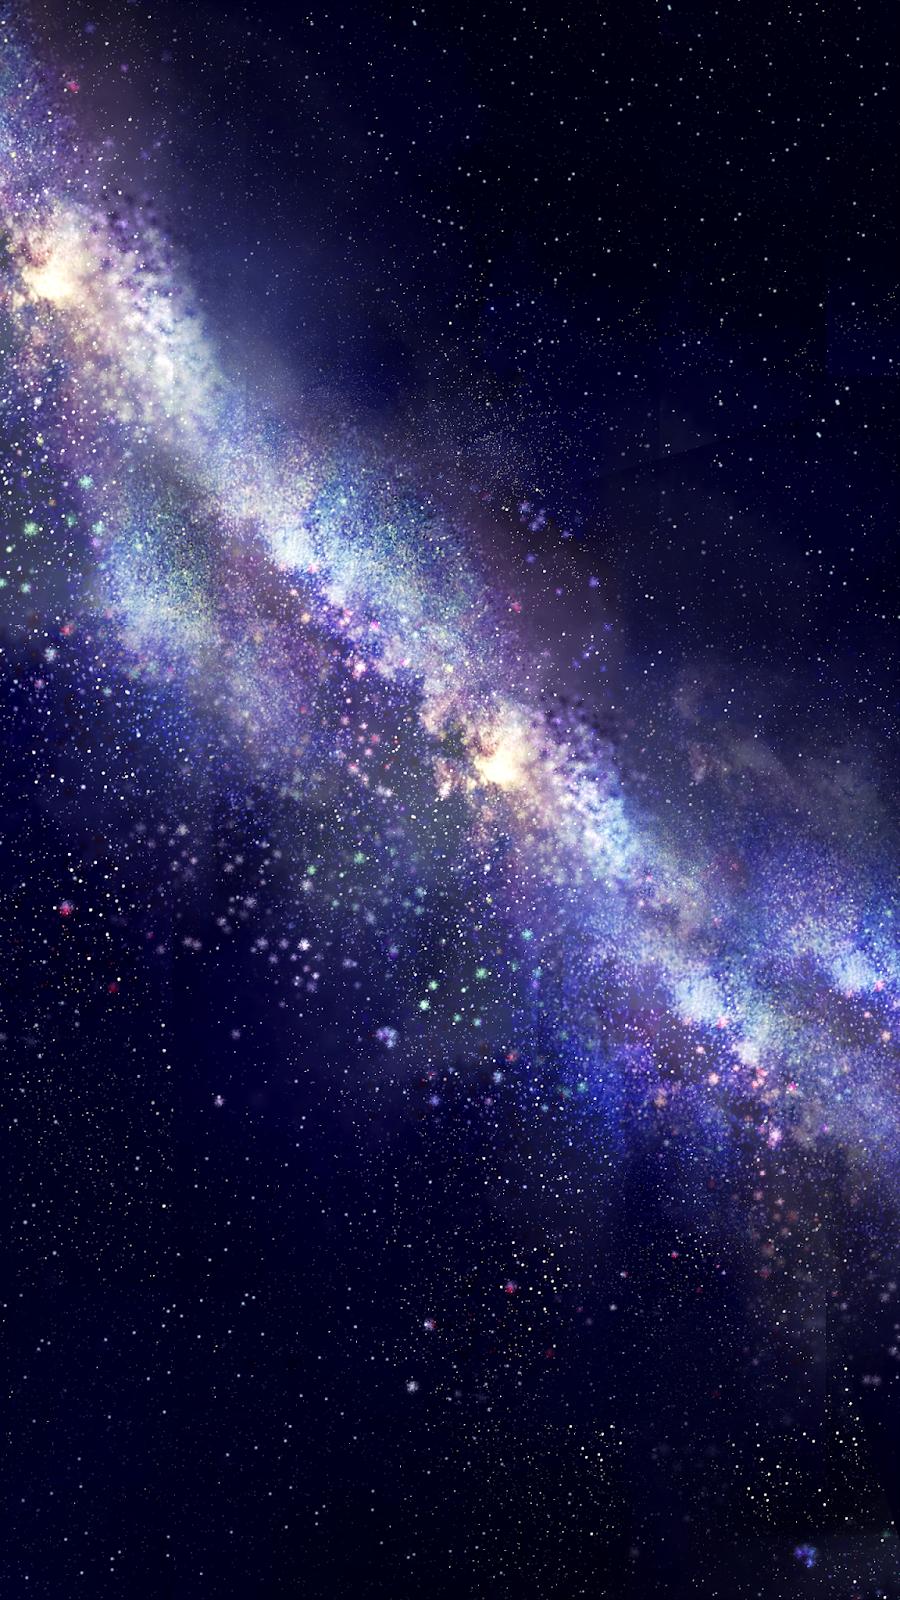 Midnight Milky Way 宇宙 壁紙 銀河 星空